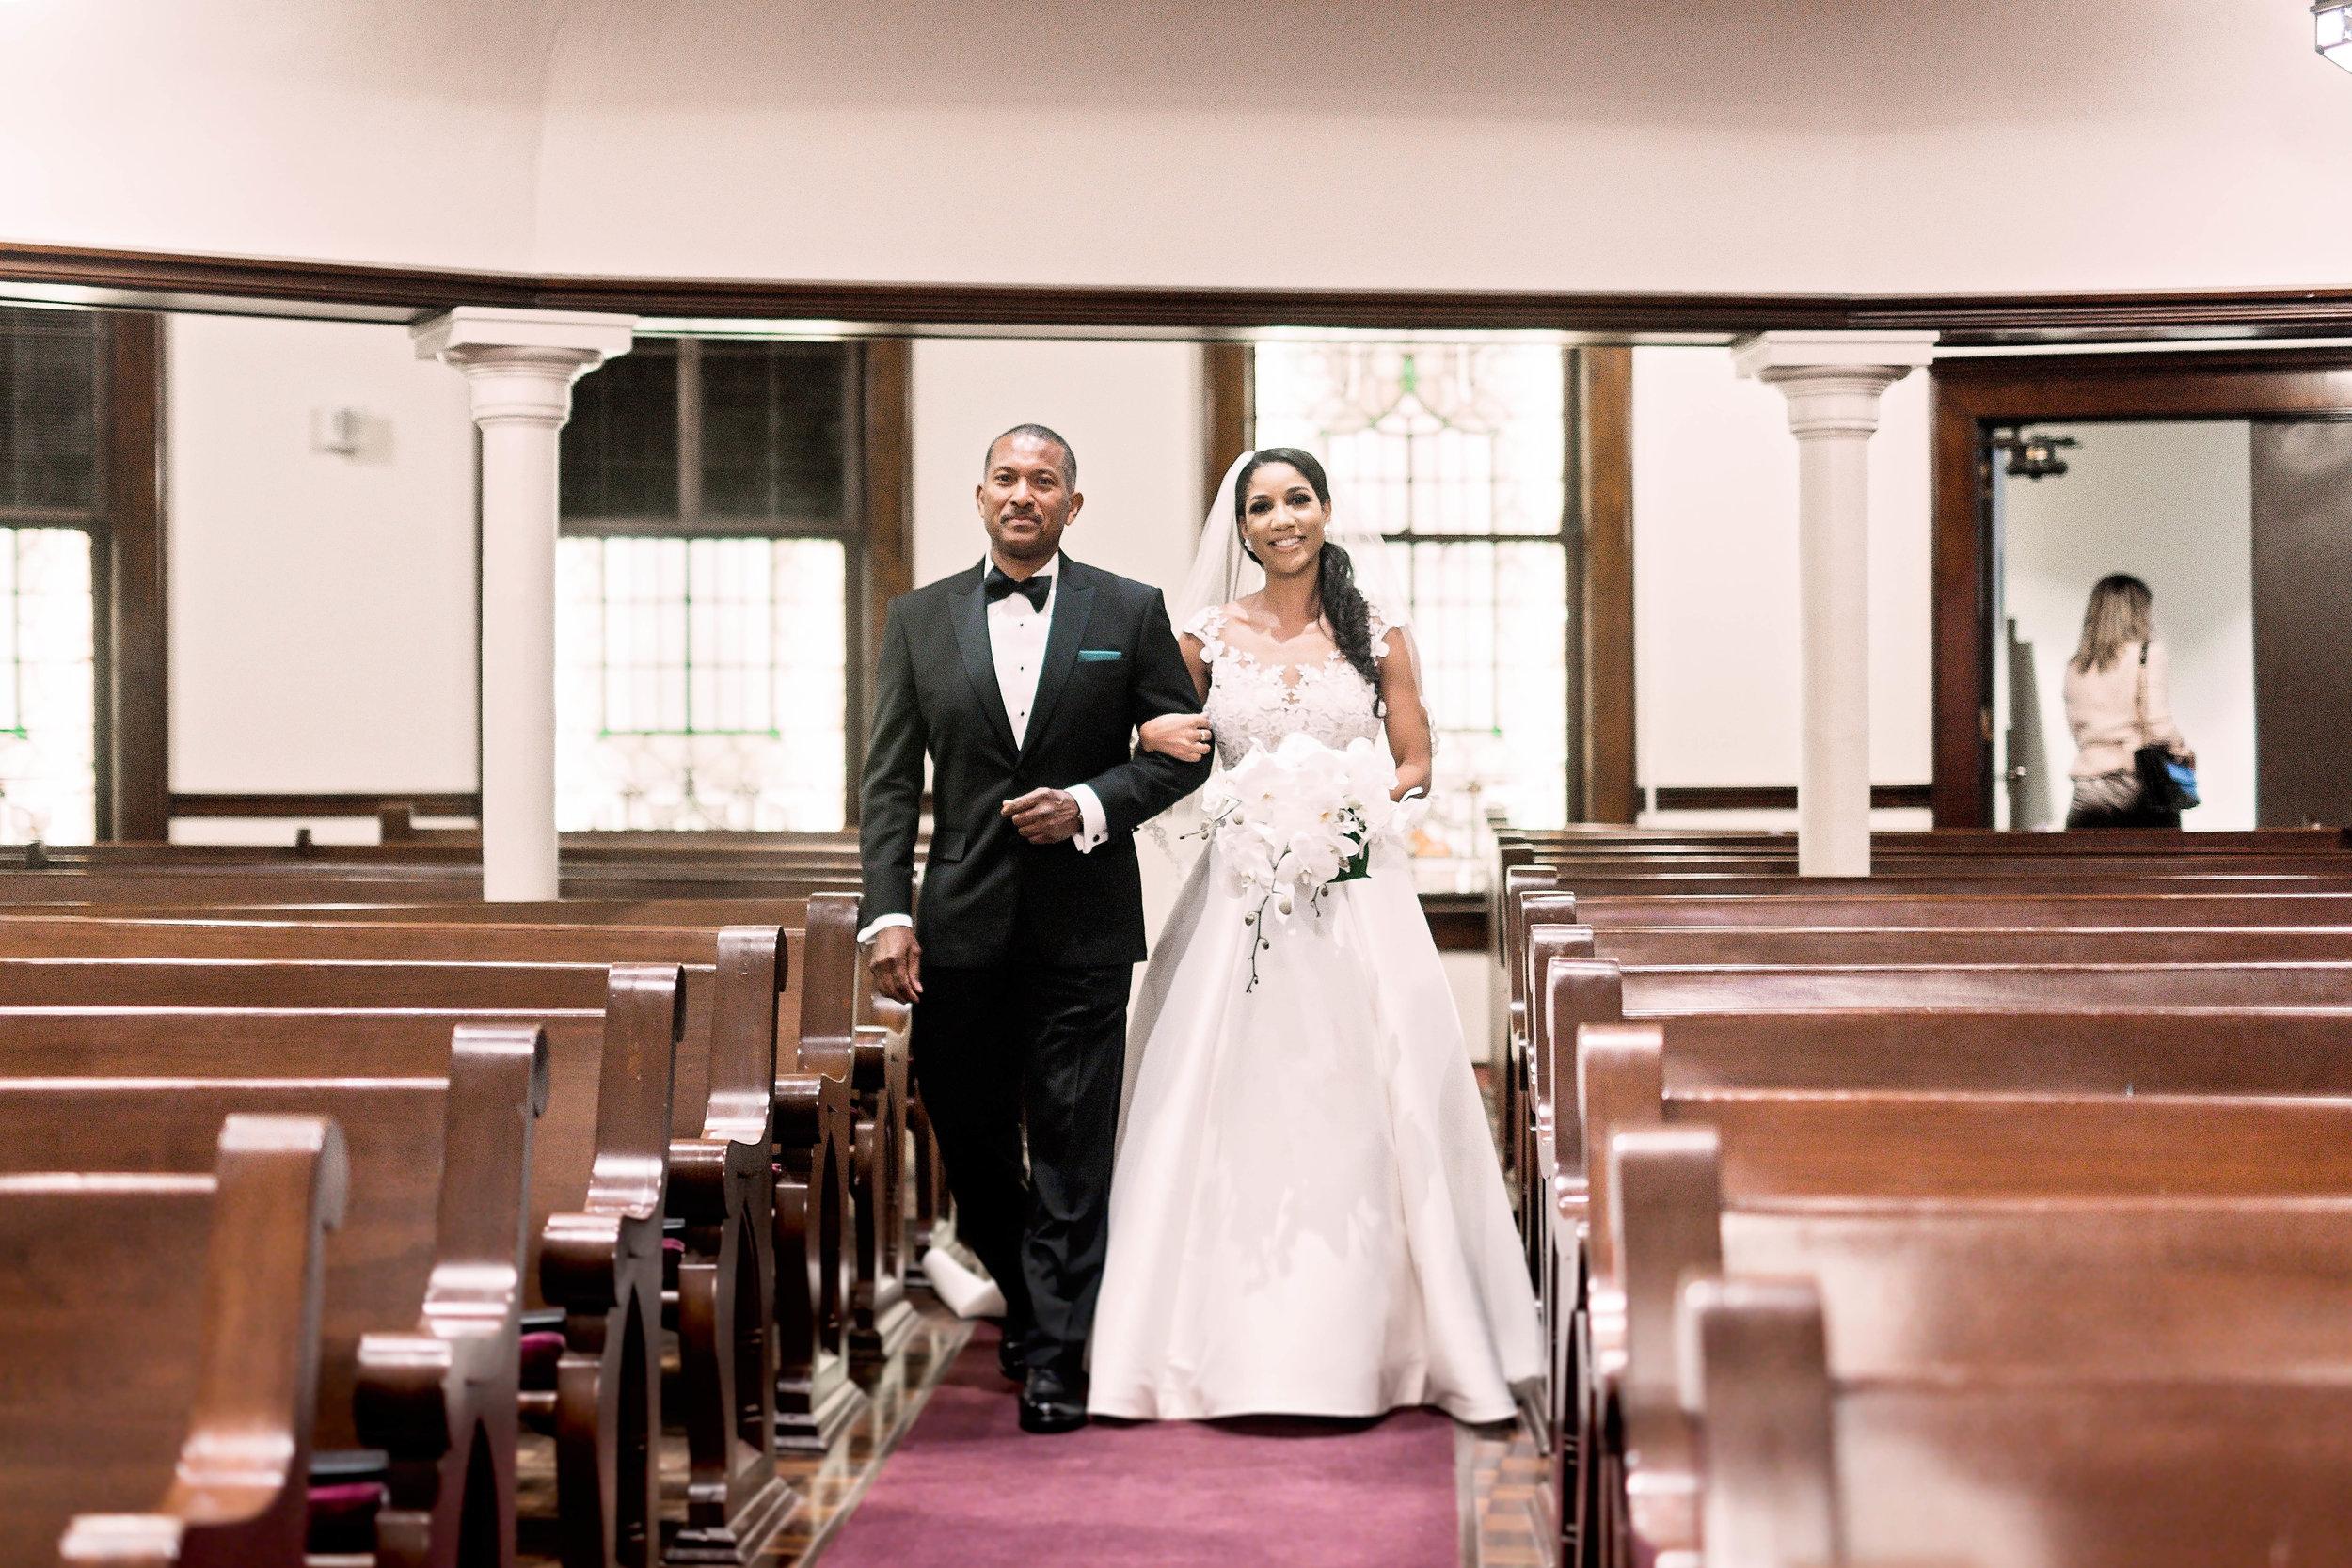 Houston Wedding- Pharris Photography- Ceremony- Natalie + Mark- Father & Bride